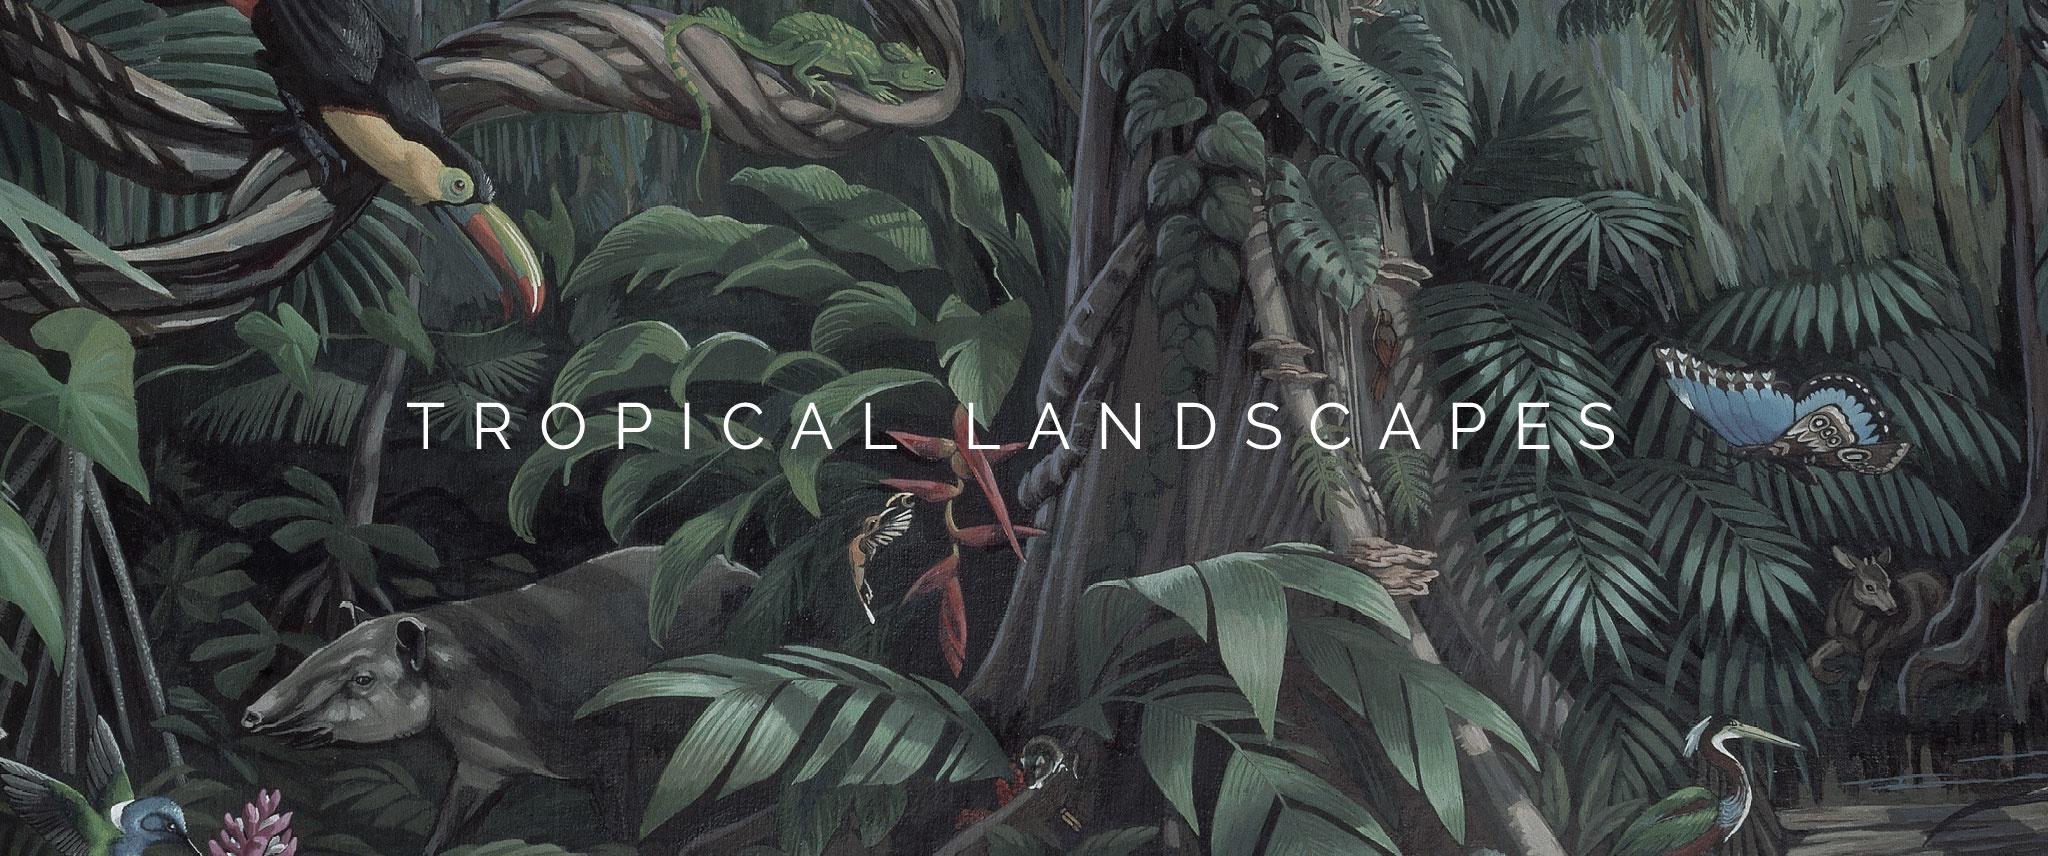 Behang Tropical Landscapes